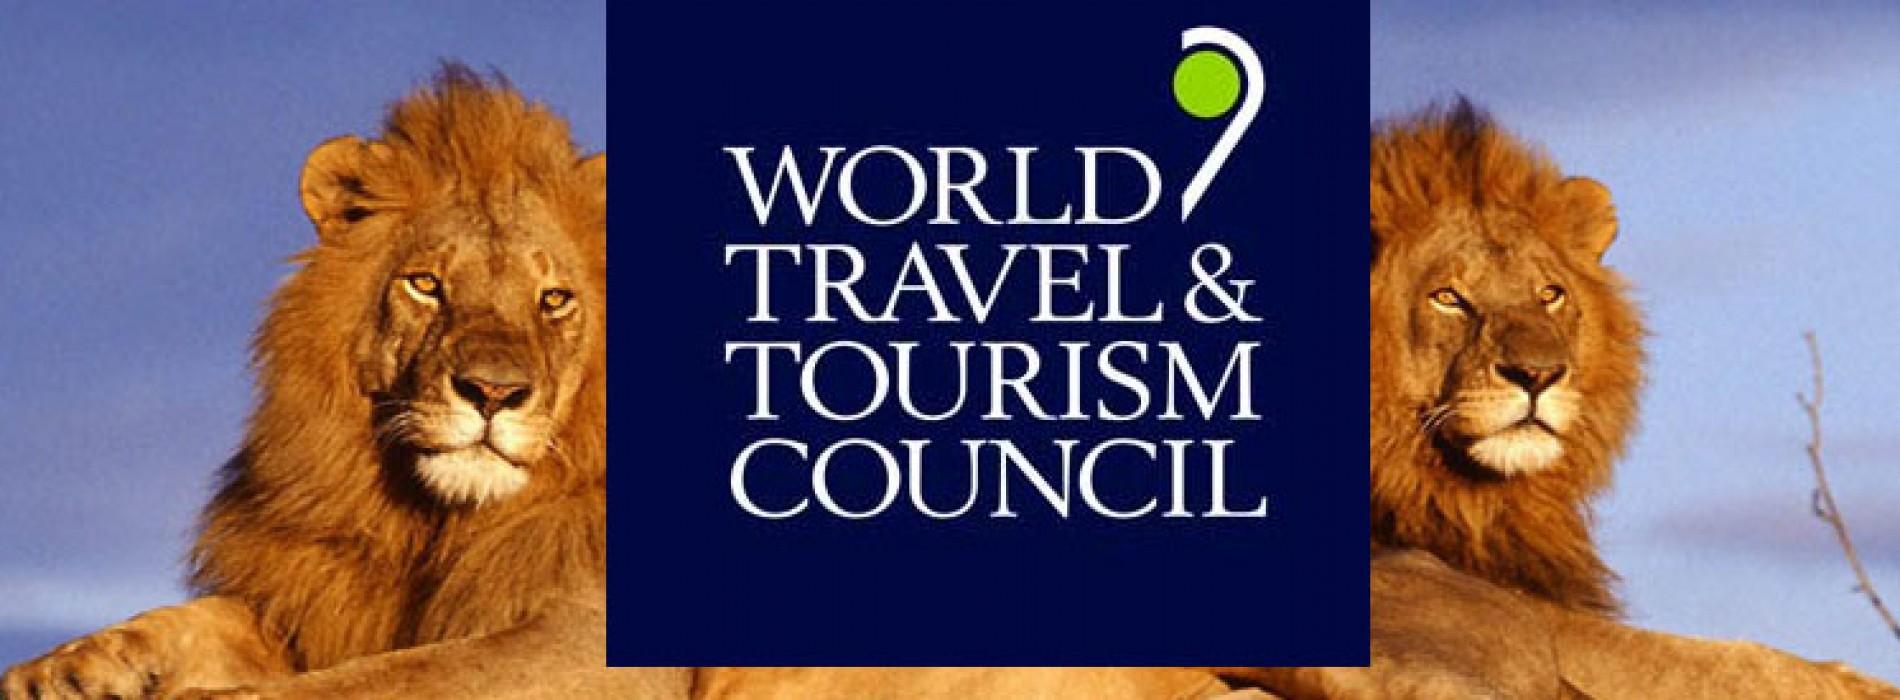 WTTC commends South Africa tourism visa changes